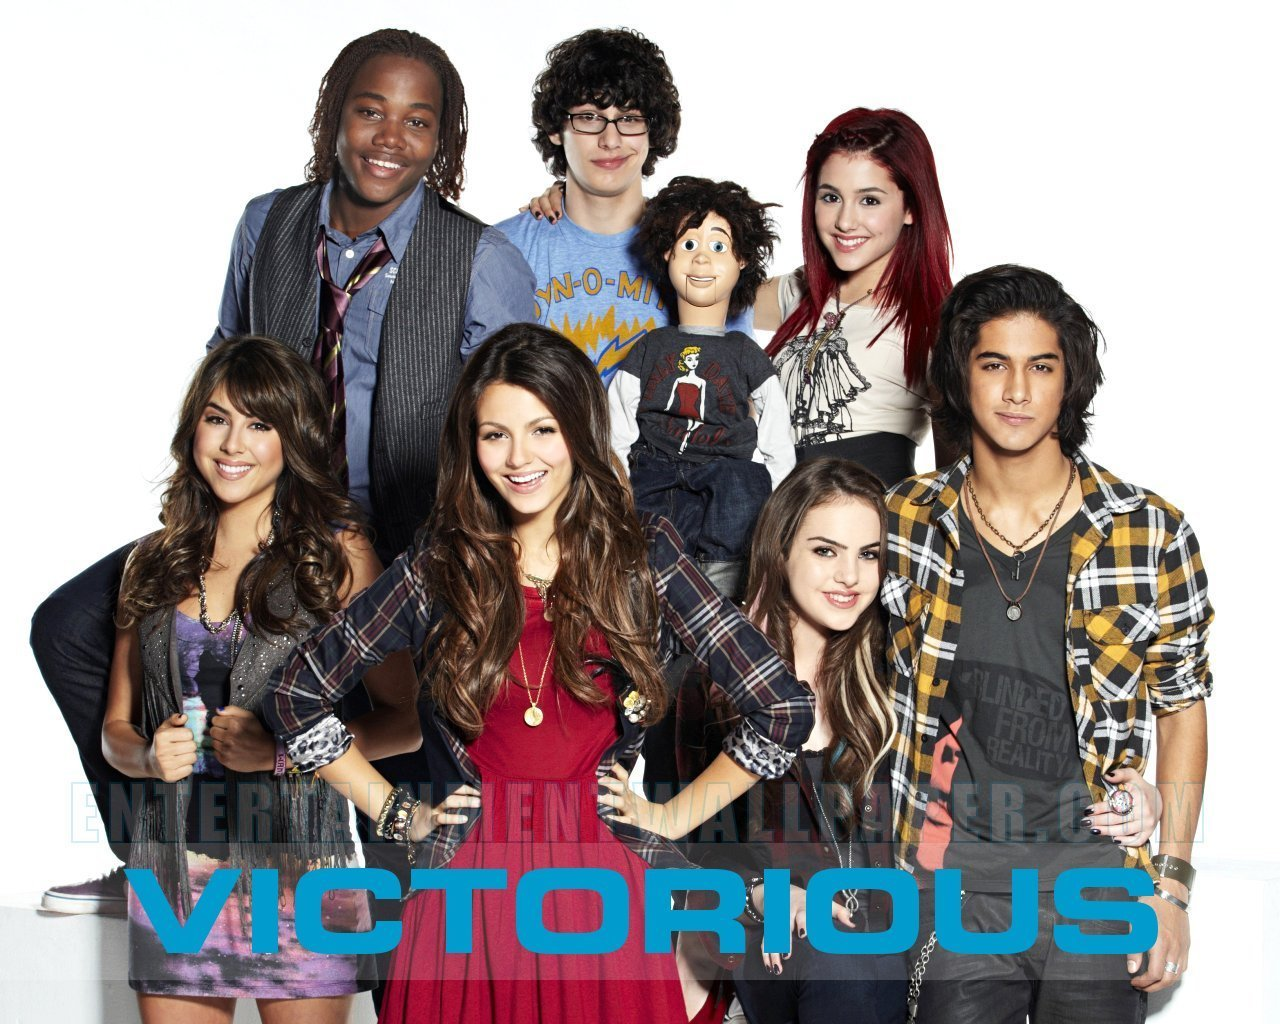 Datei:Victorious.jpg